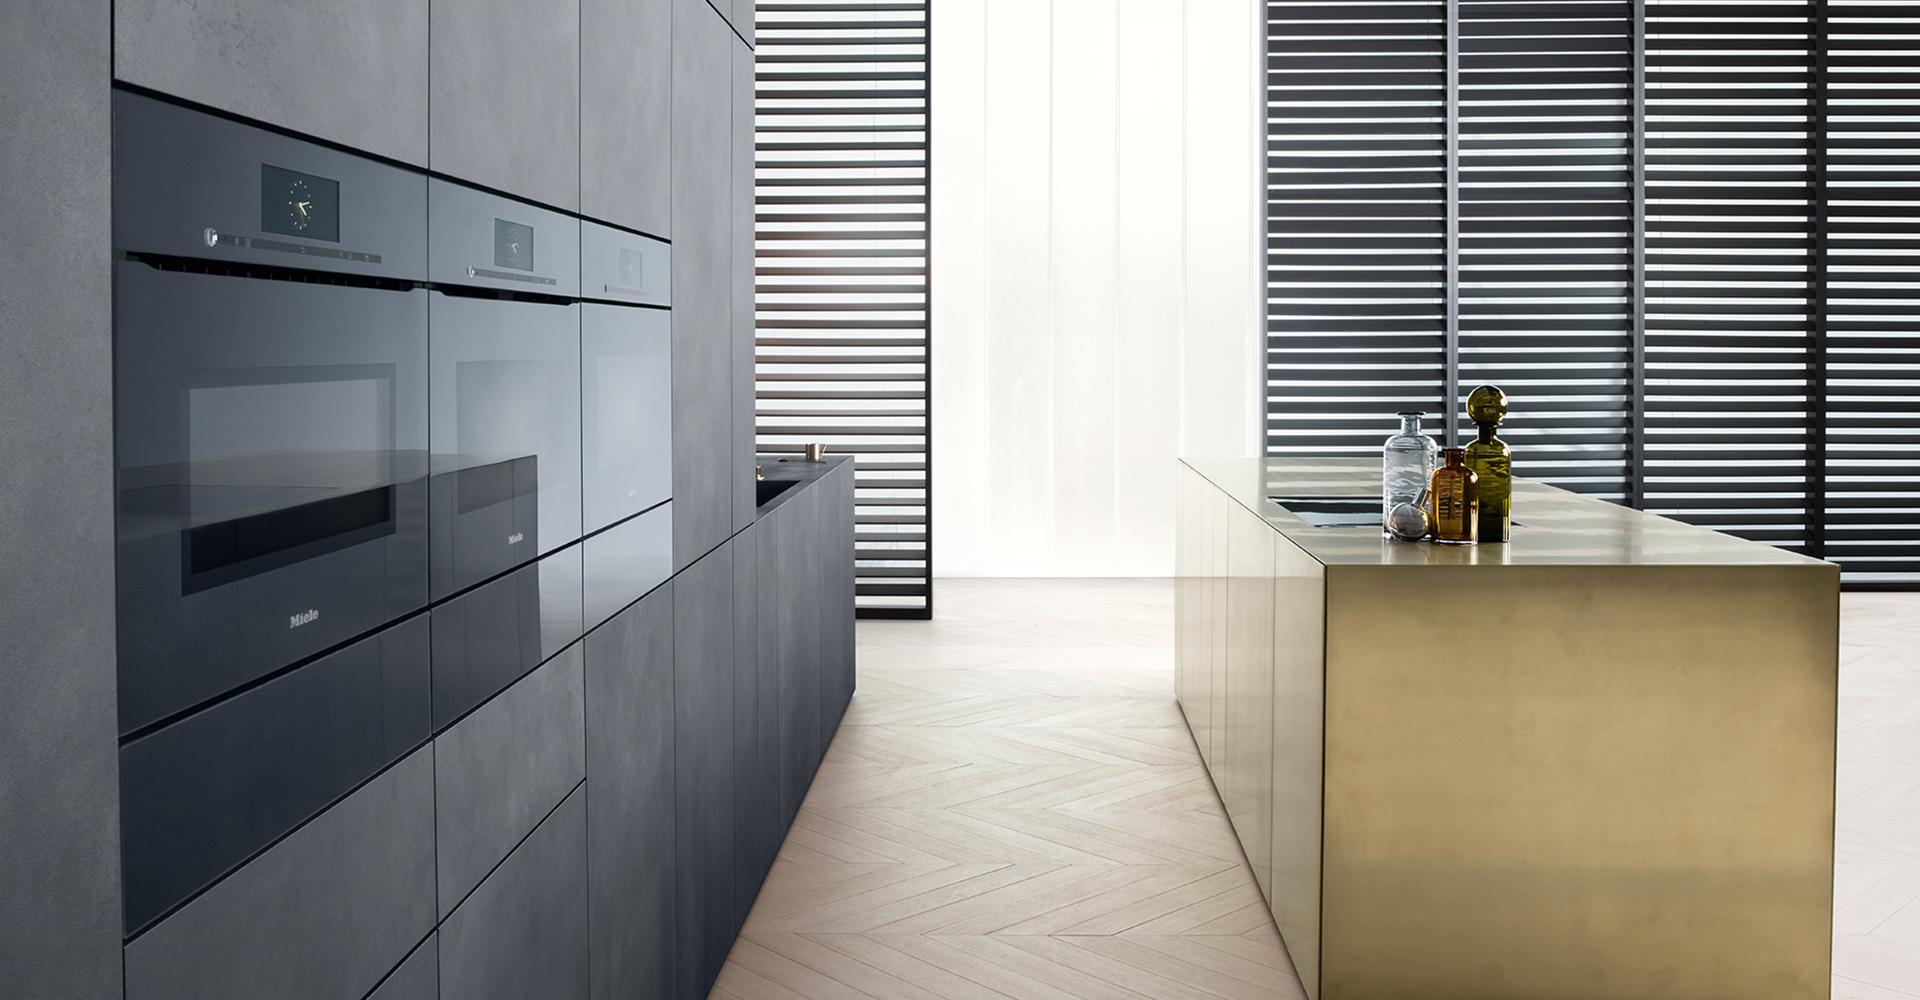 artline einbauger te mit touch2open miele. Black Bedroom Furniture Sets. Home Design Ideas